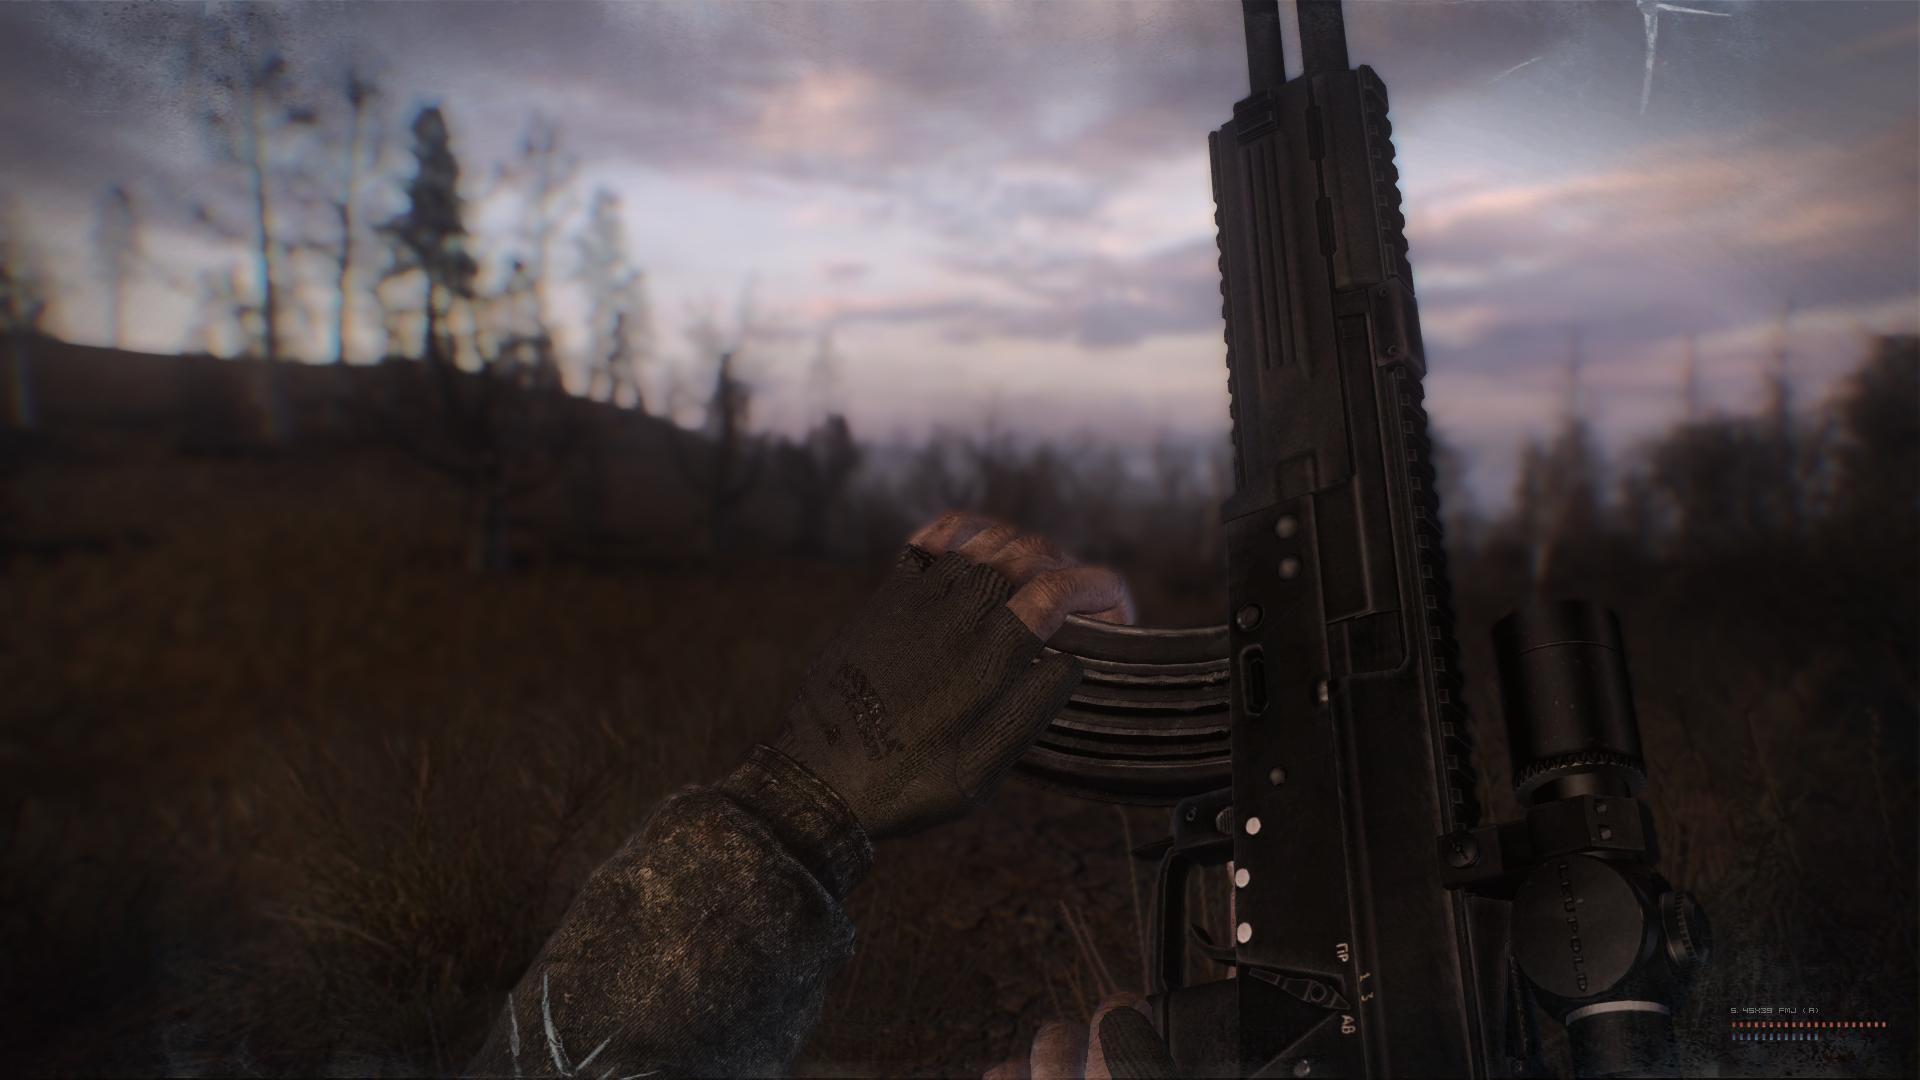 AK12 image - New age mod for S.T.A.L.K.E.R. Shadow of